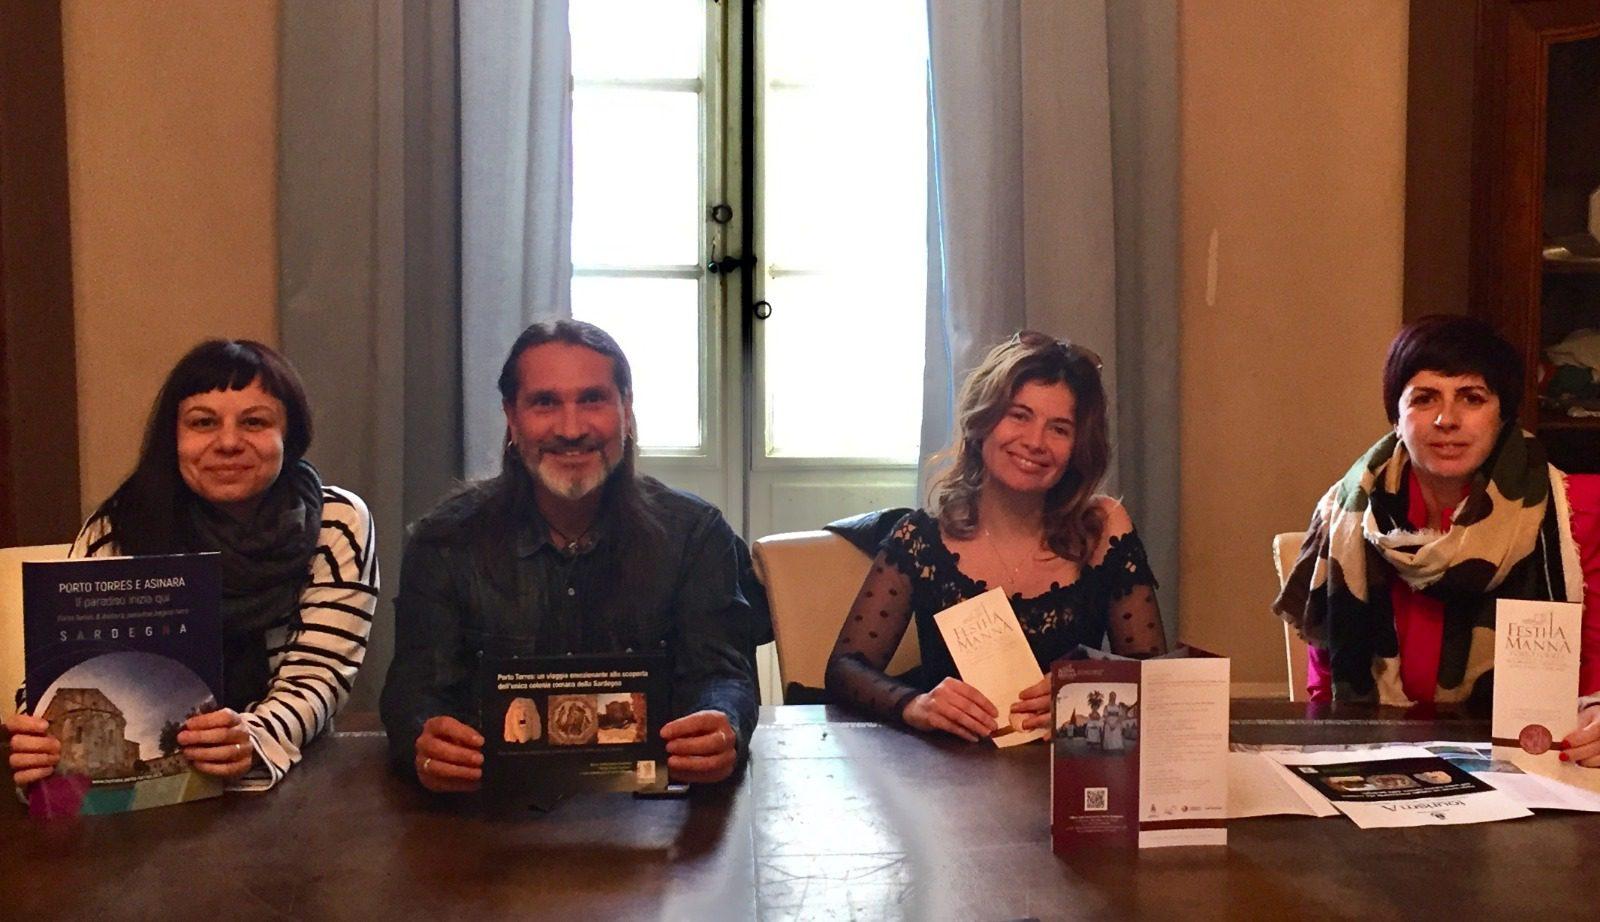 incontri con i tour operator, stand espositivi e conferenza: Porto Torres sbarca a TourismA 2020